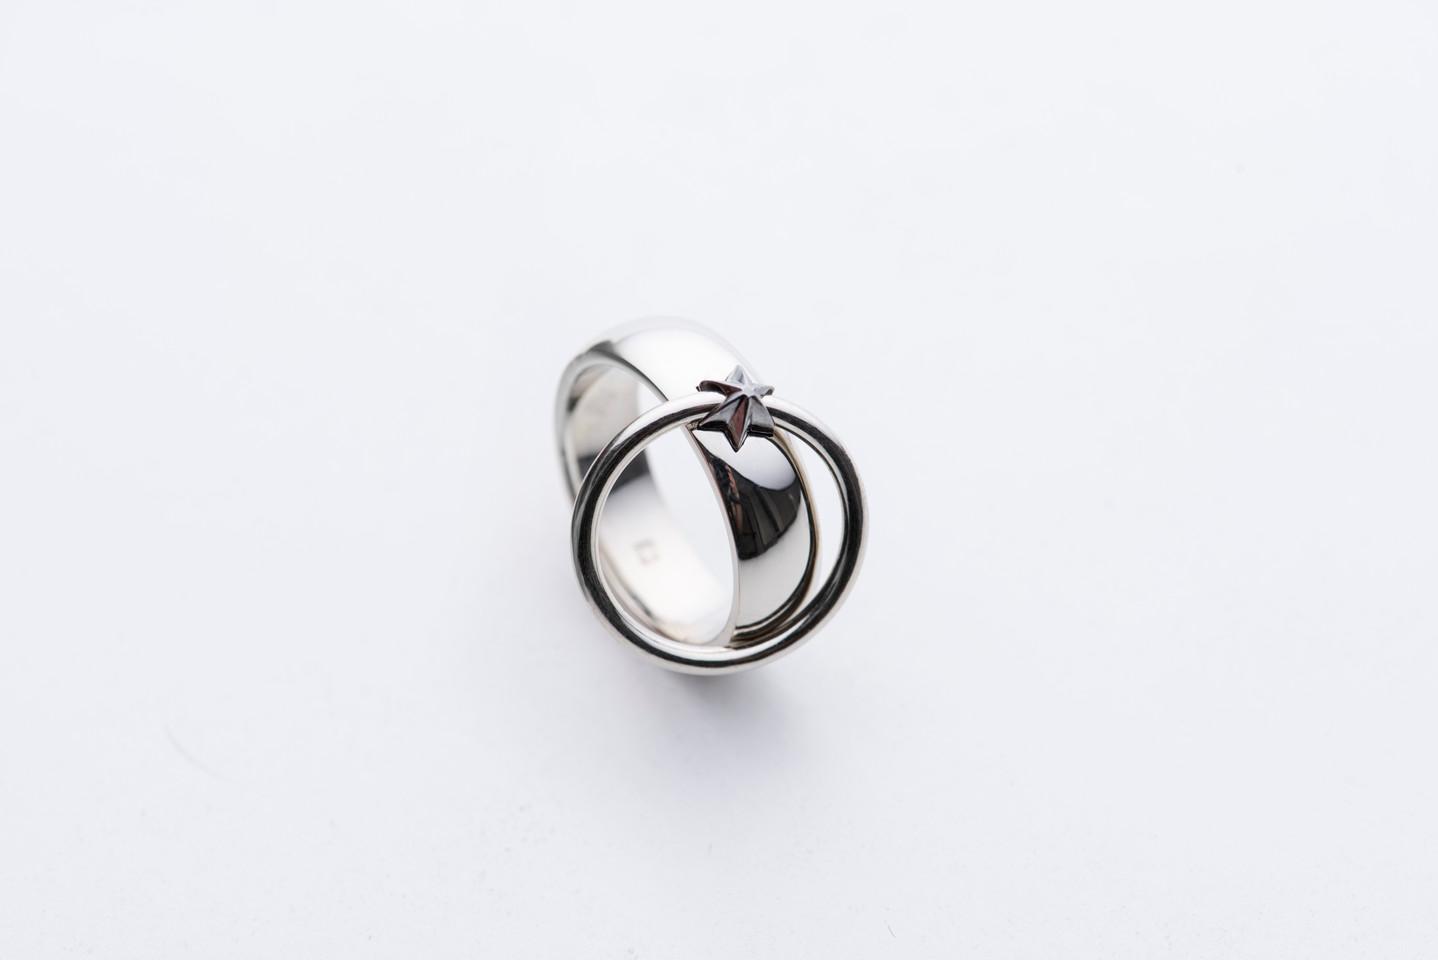 Jegygyűrű pár